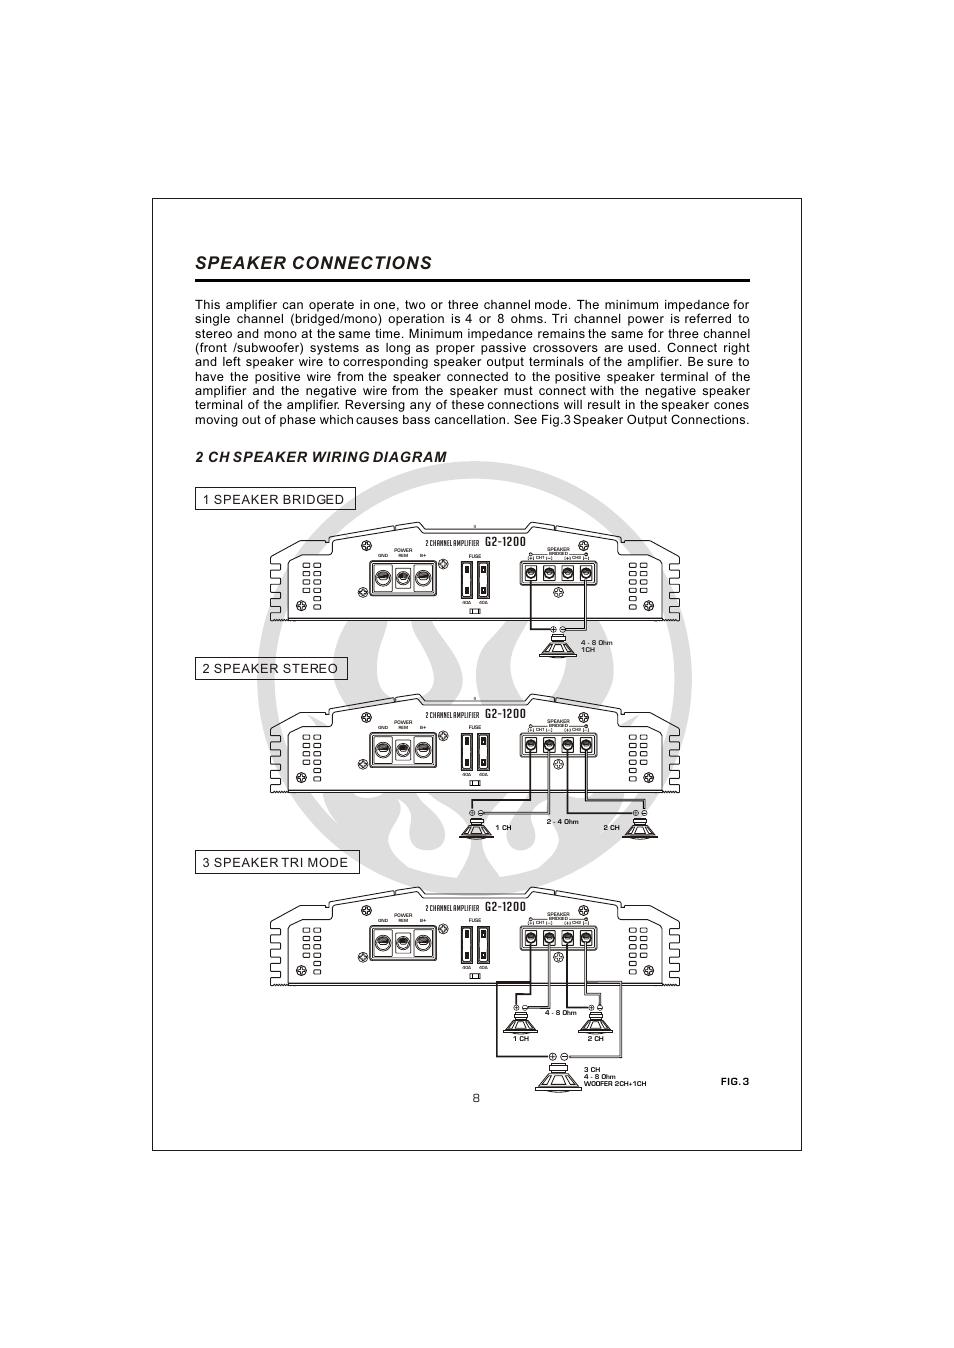 hight resolution of  10 speaker connections 2 ch speaker wiring diagram interfire audio g2